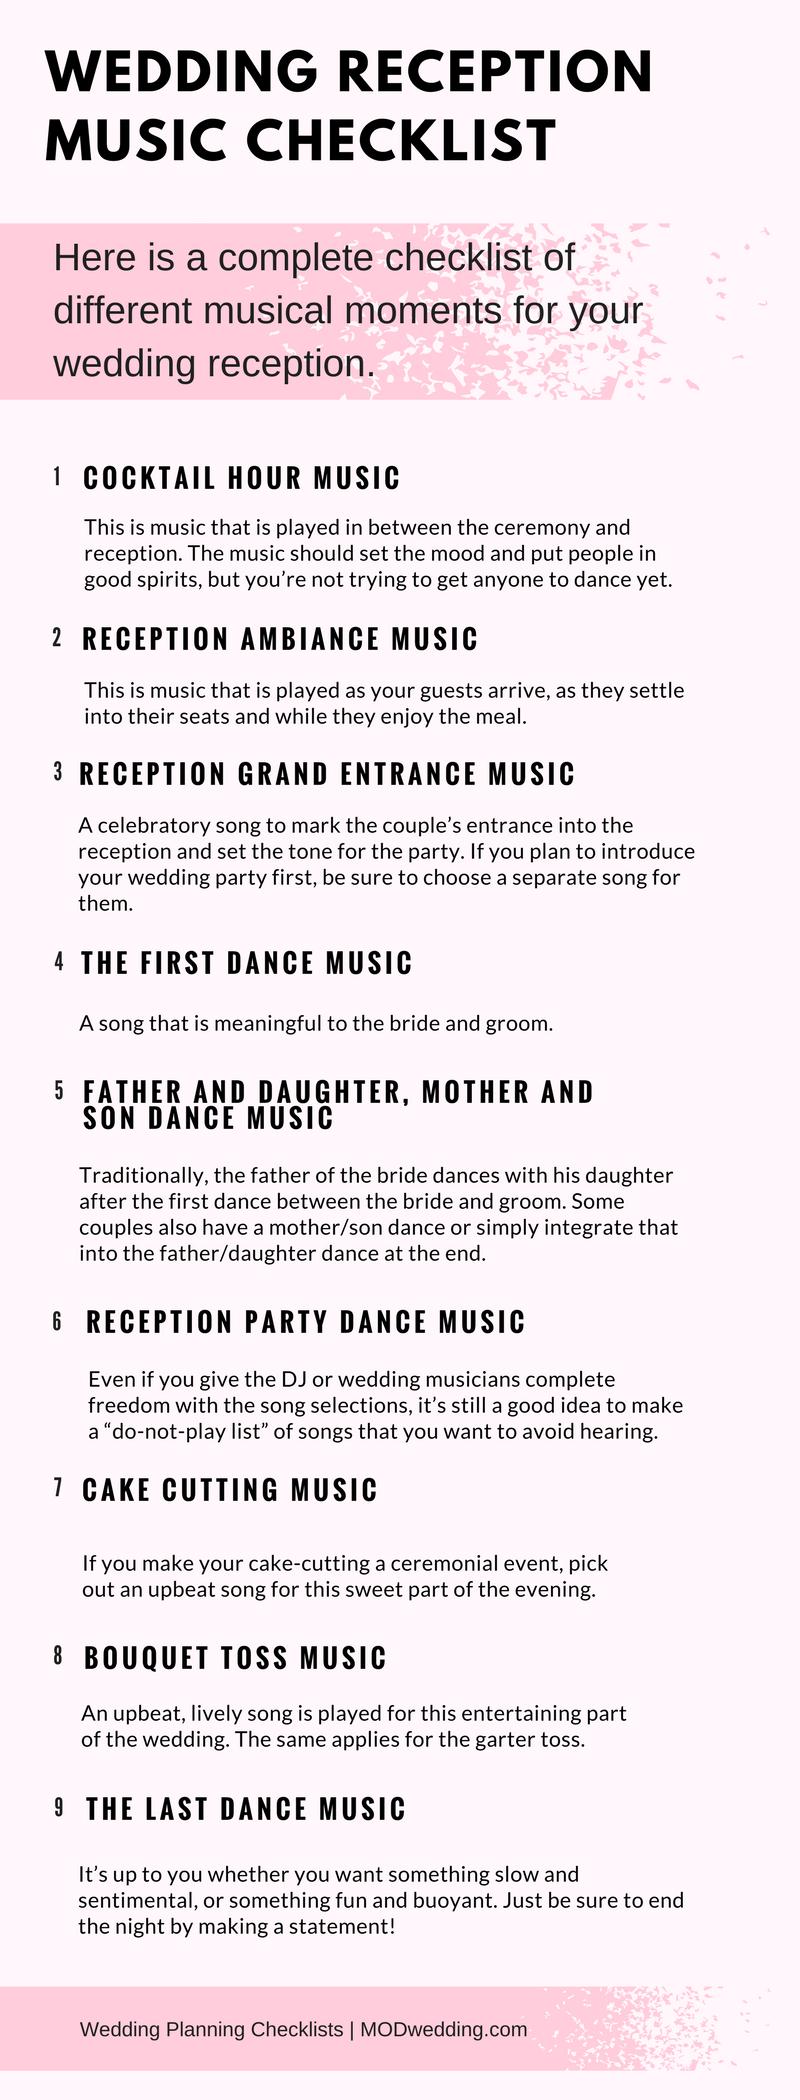 Wedding Reception Music Checklist Wedding reception